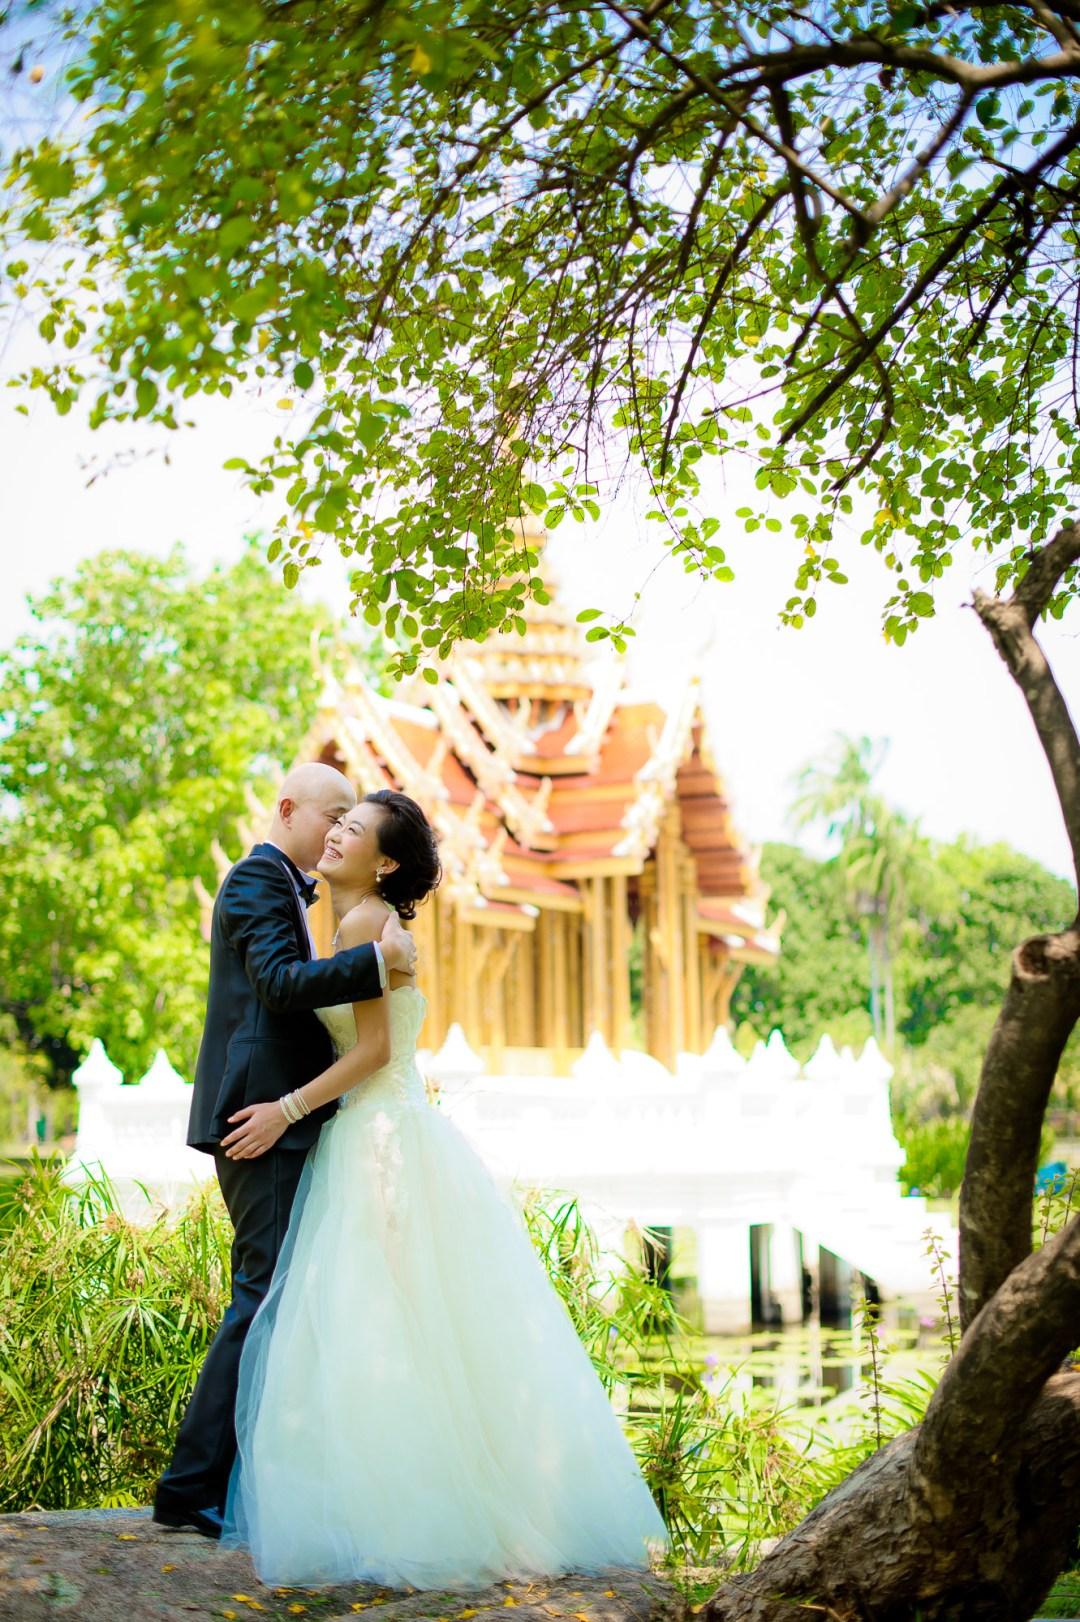 Bangkok Wedding Photography | Rama IX Park Pre-Wedding Photography